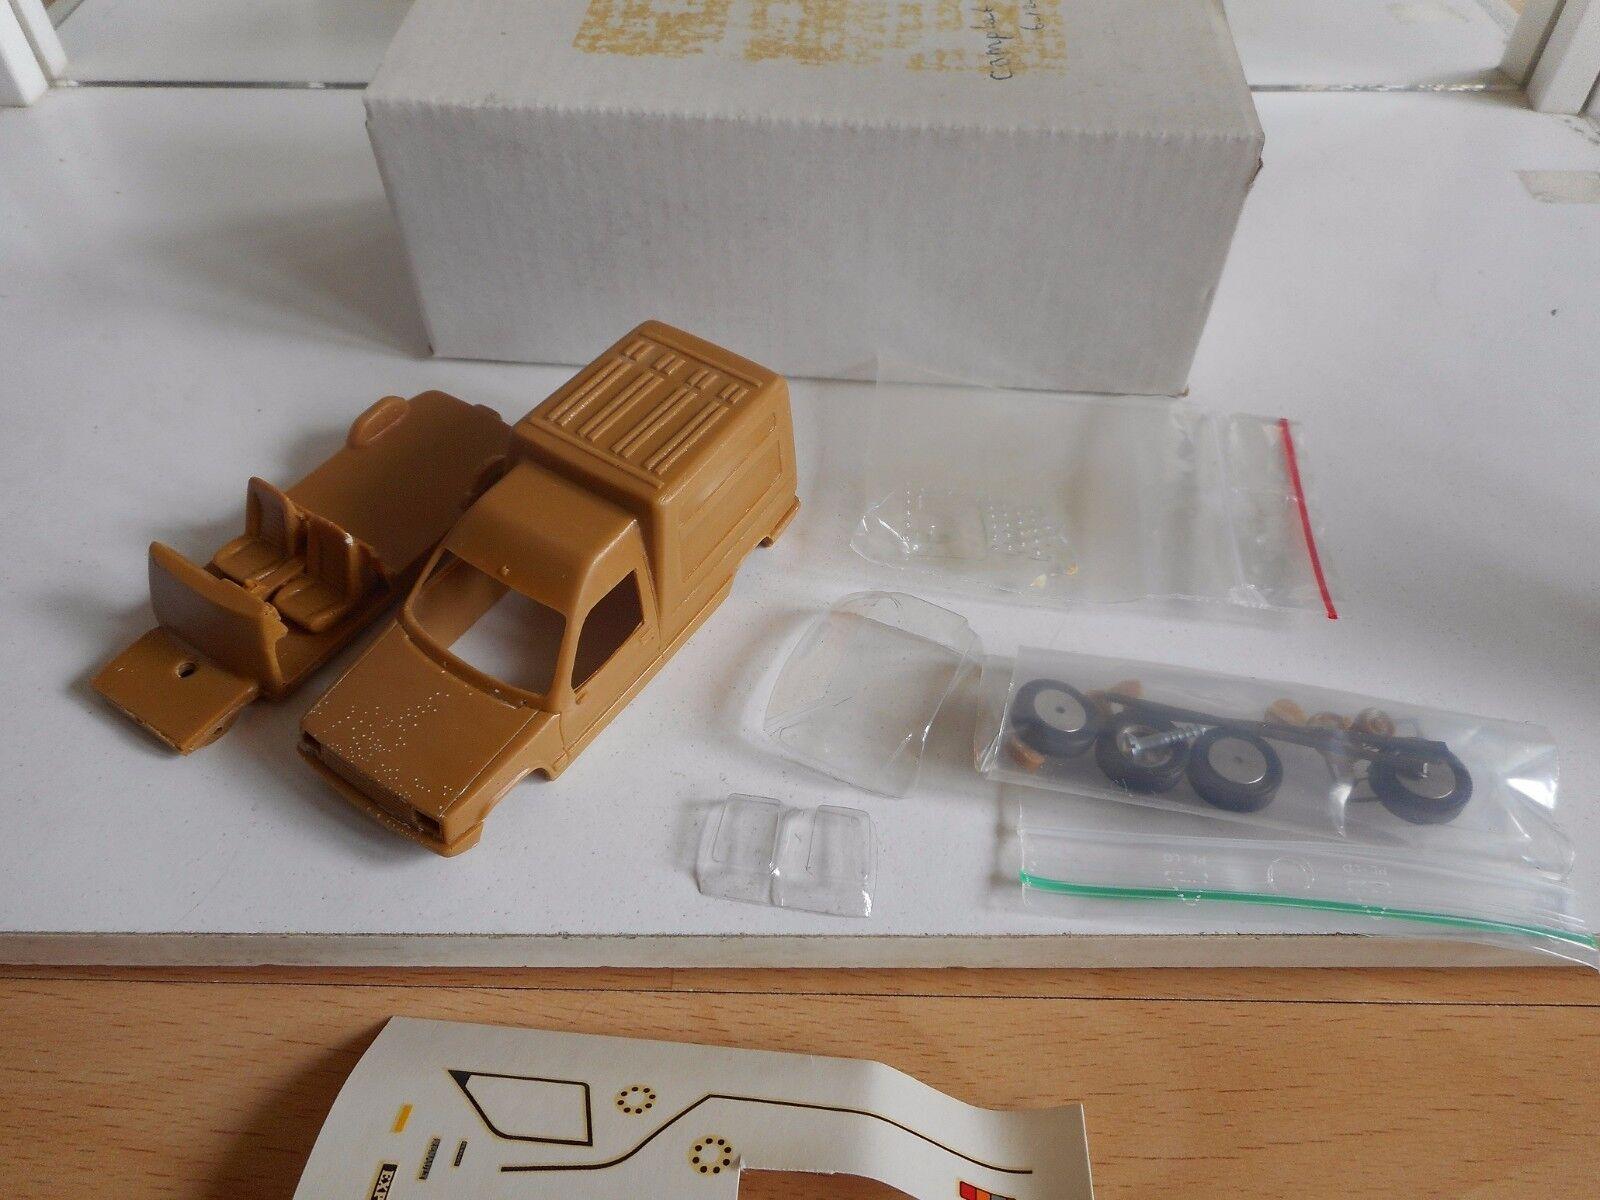 Model Resin Resin Resin Kit Alezan Super 5 Express Tole on 1 43 in Box eb6e8e